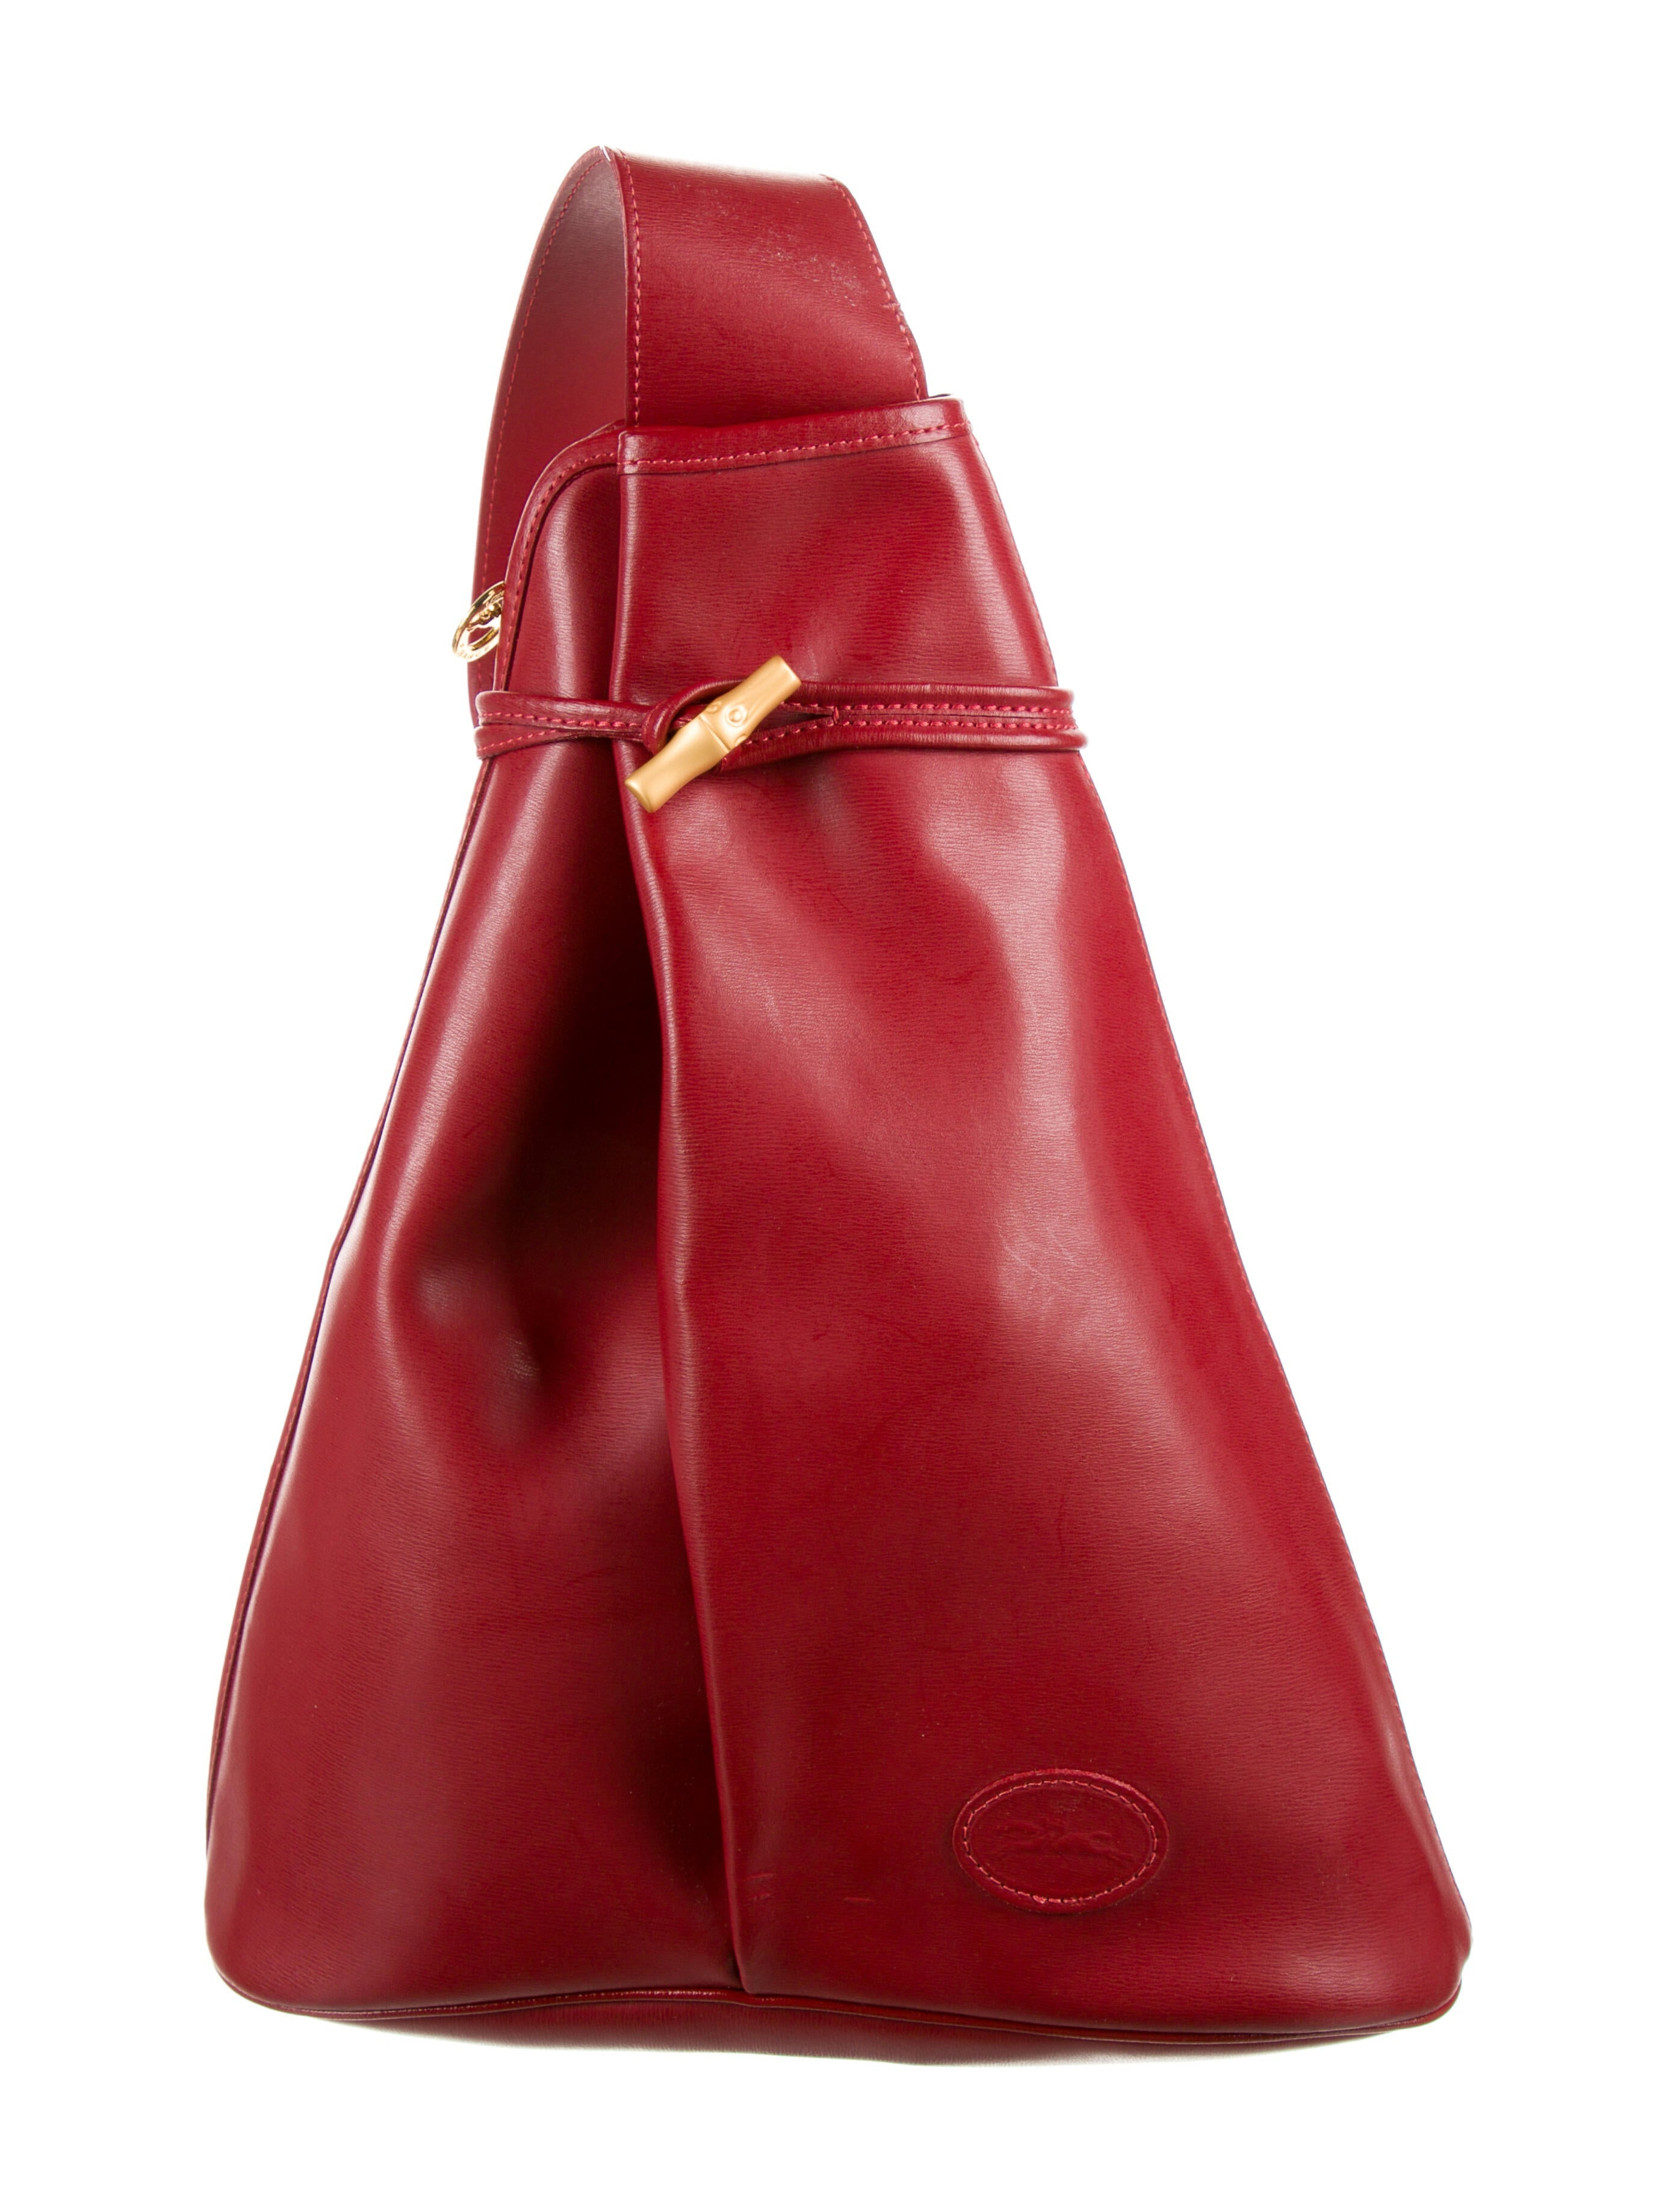 Longchamp Roseau Sling Bag - Handbags - WL835983   The RealReal